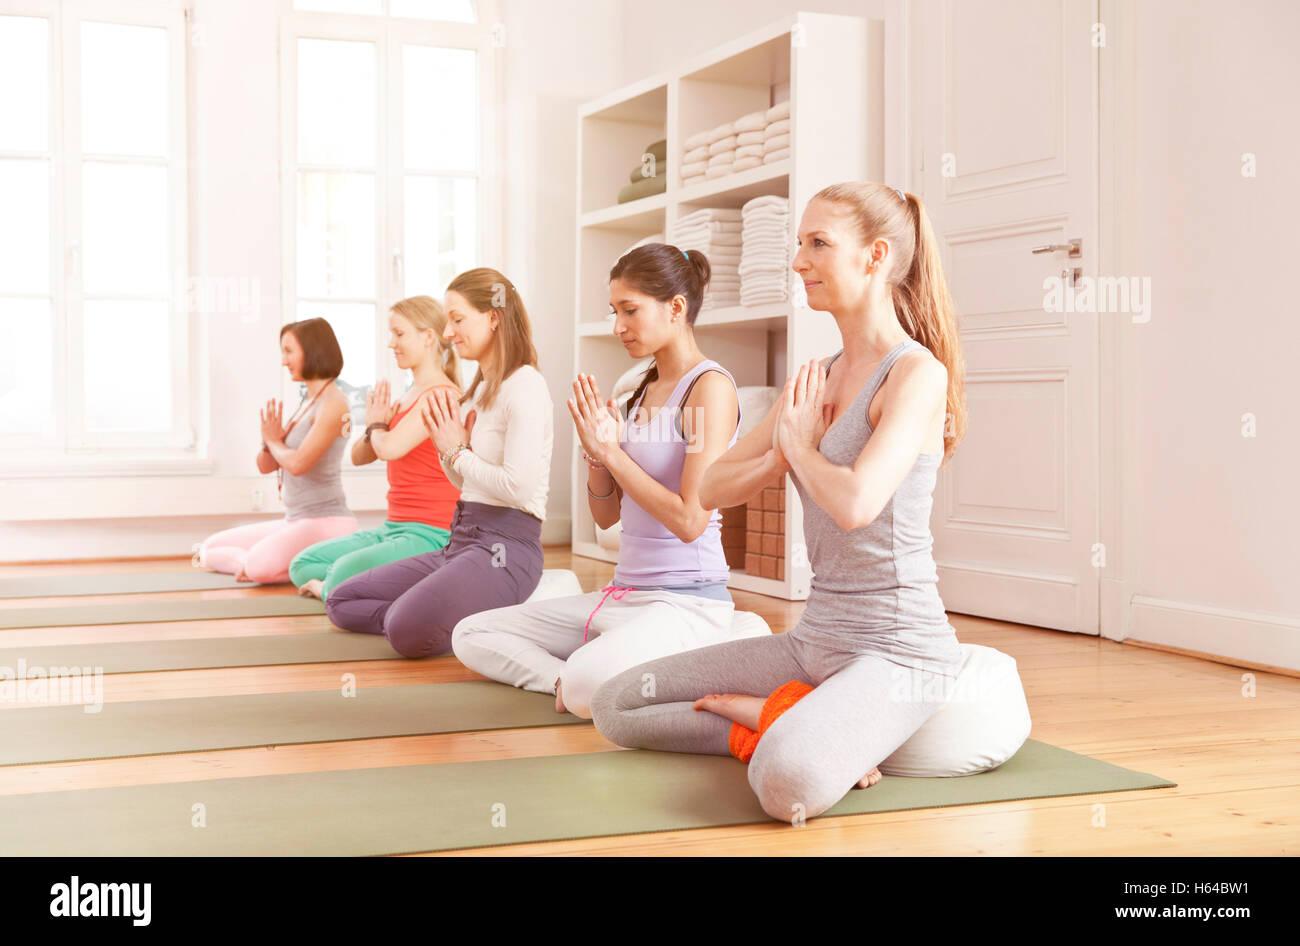 Group of women in yoga studio sitting in Lotus pose - Stock Image